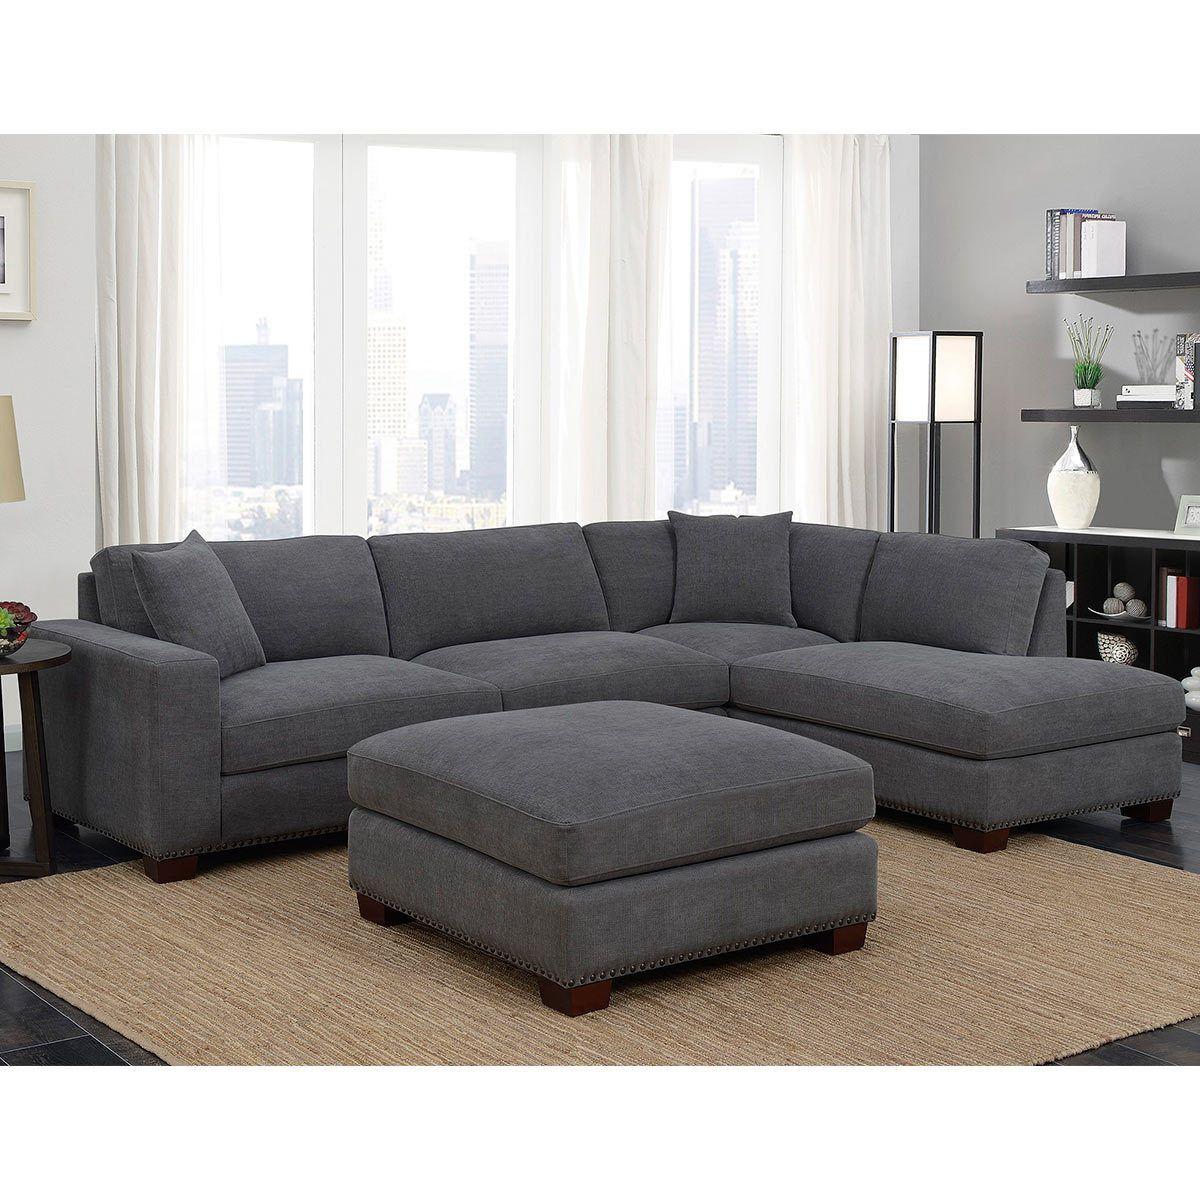 Bainbridge Home 3 Piece Grey Fabric Sectional Sofa With Ottoman